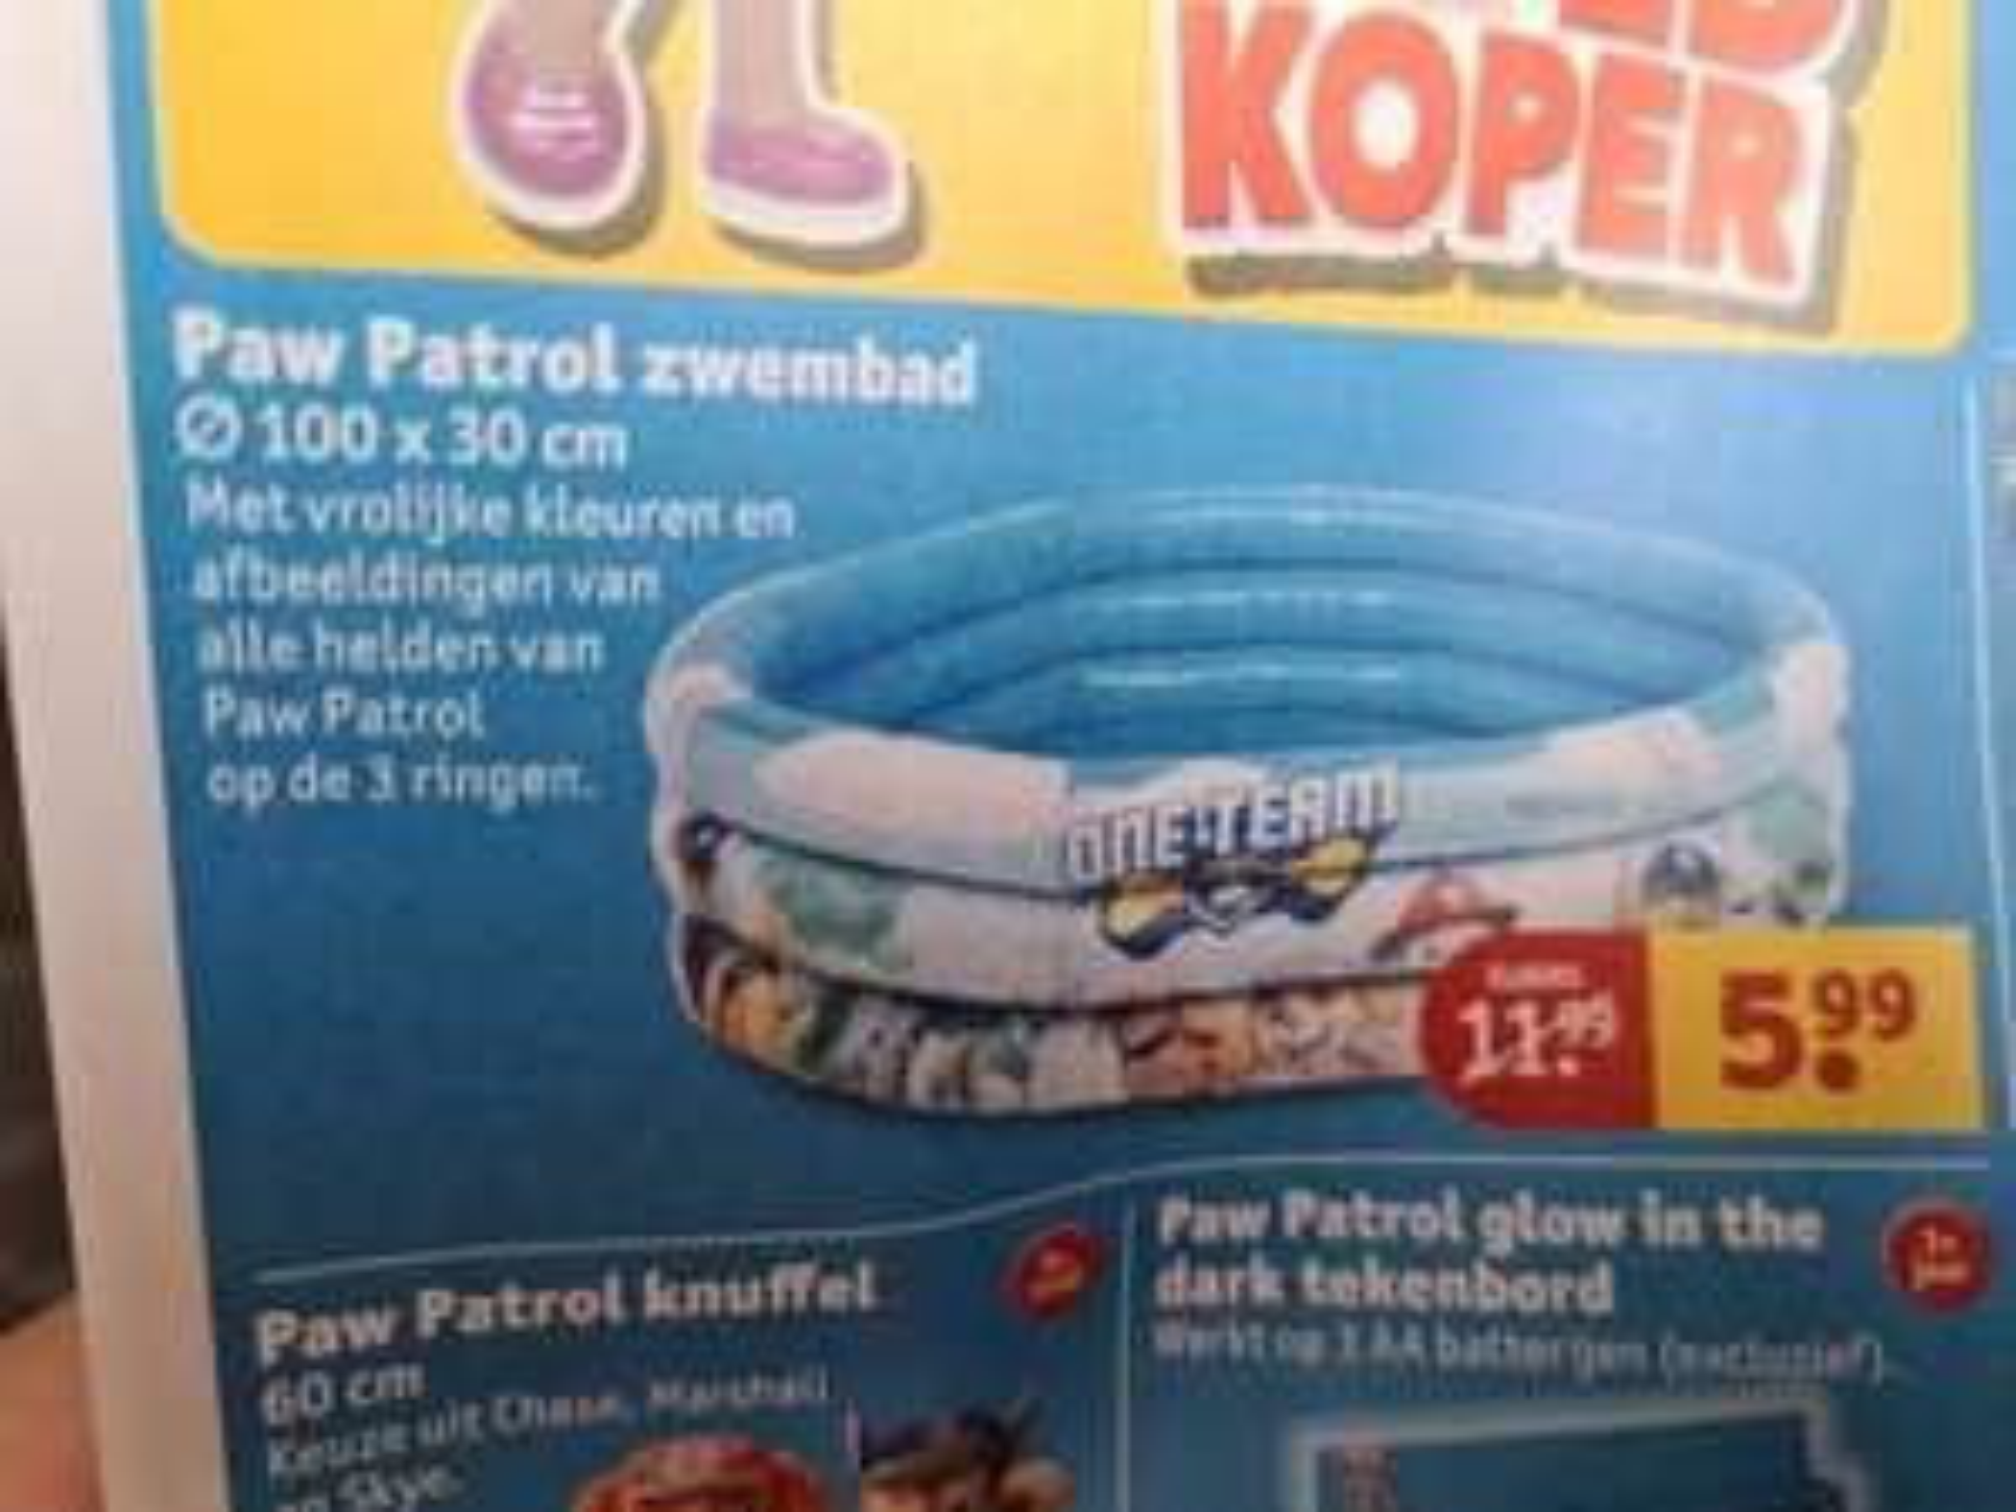 Paw patrol zwembad